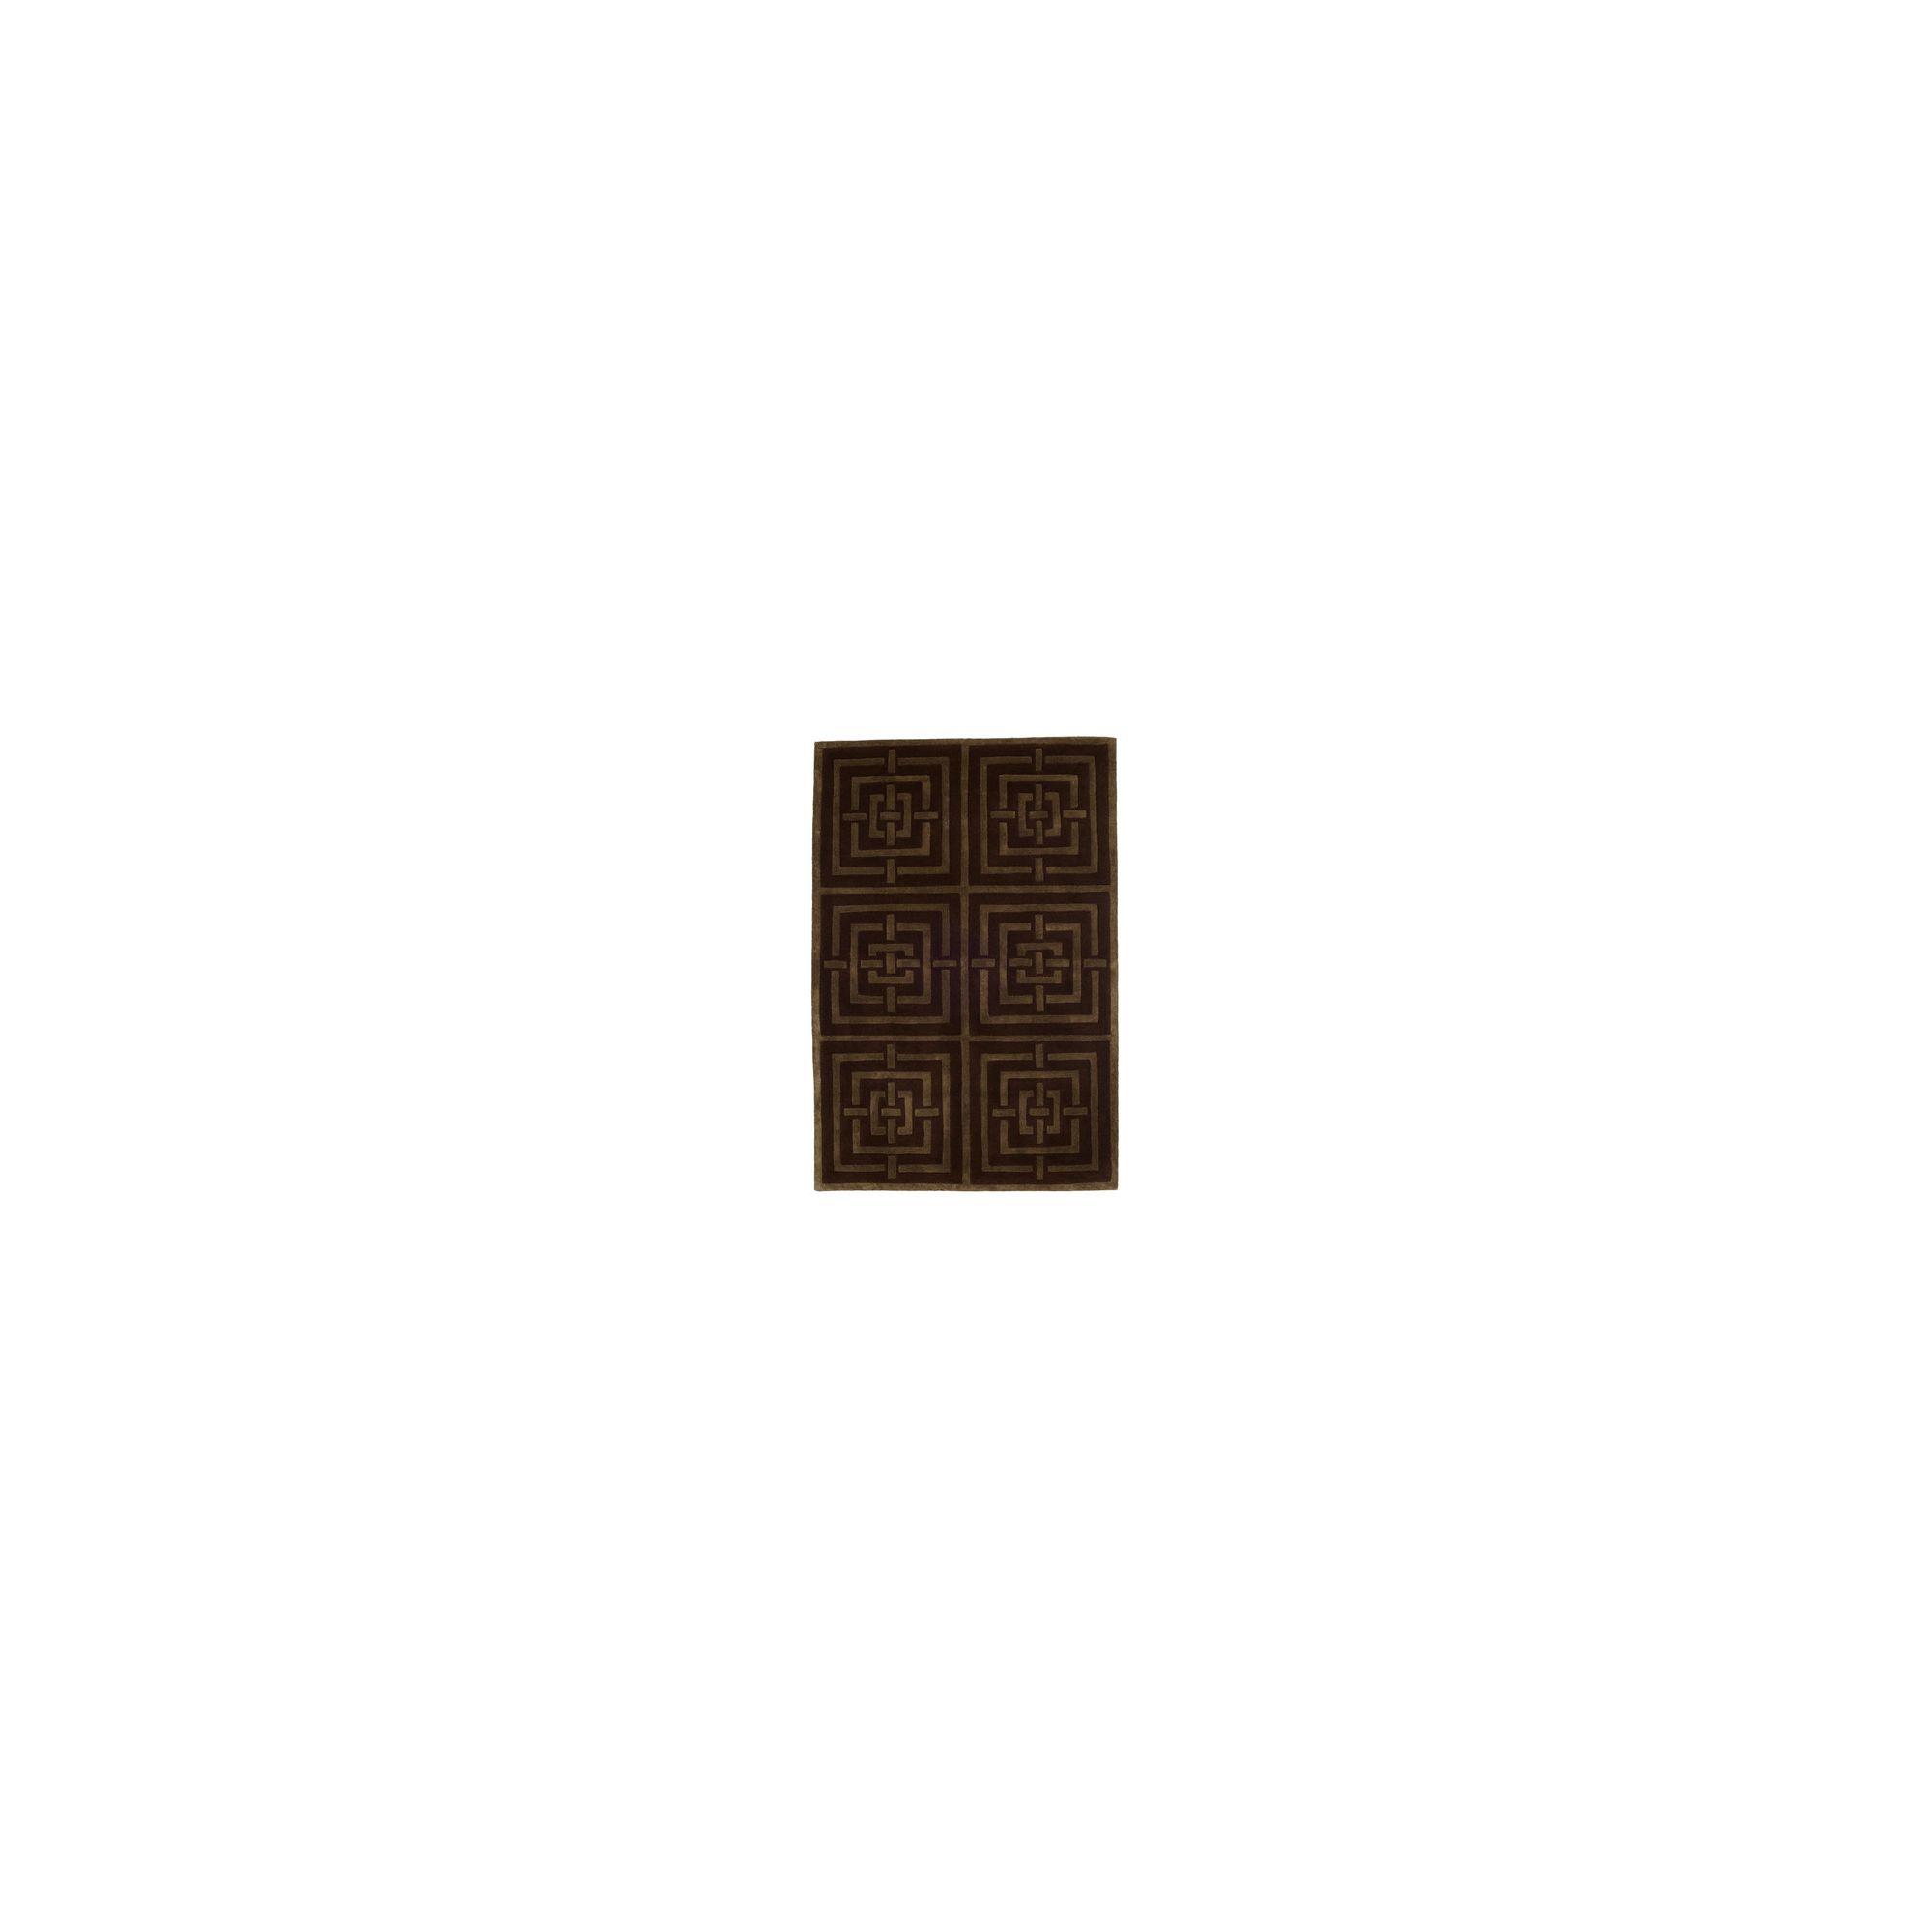 Husain International Maze Brown/Orange Tufted Rug - 180cm x 120cm (5 ft 11 in x 3 ft 11 in)